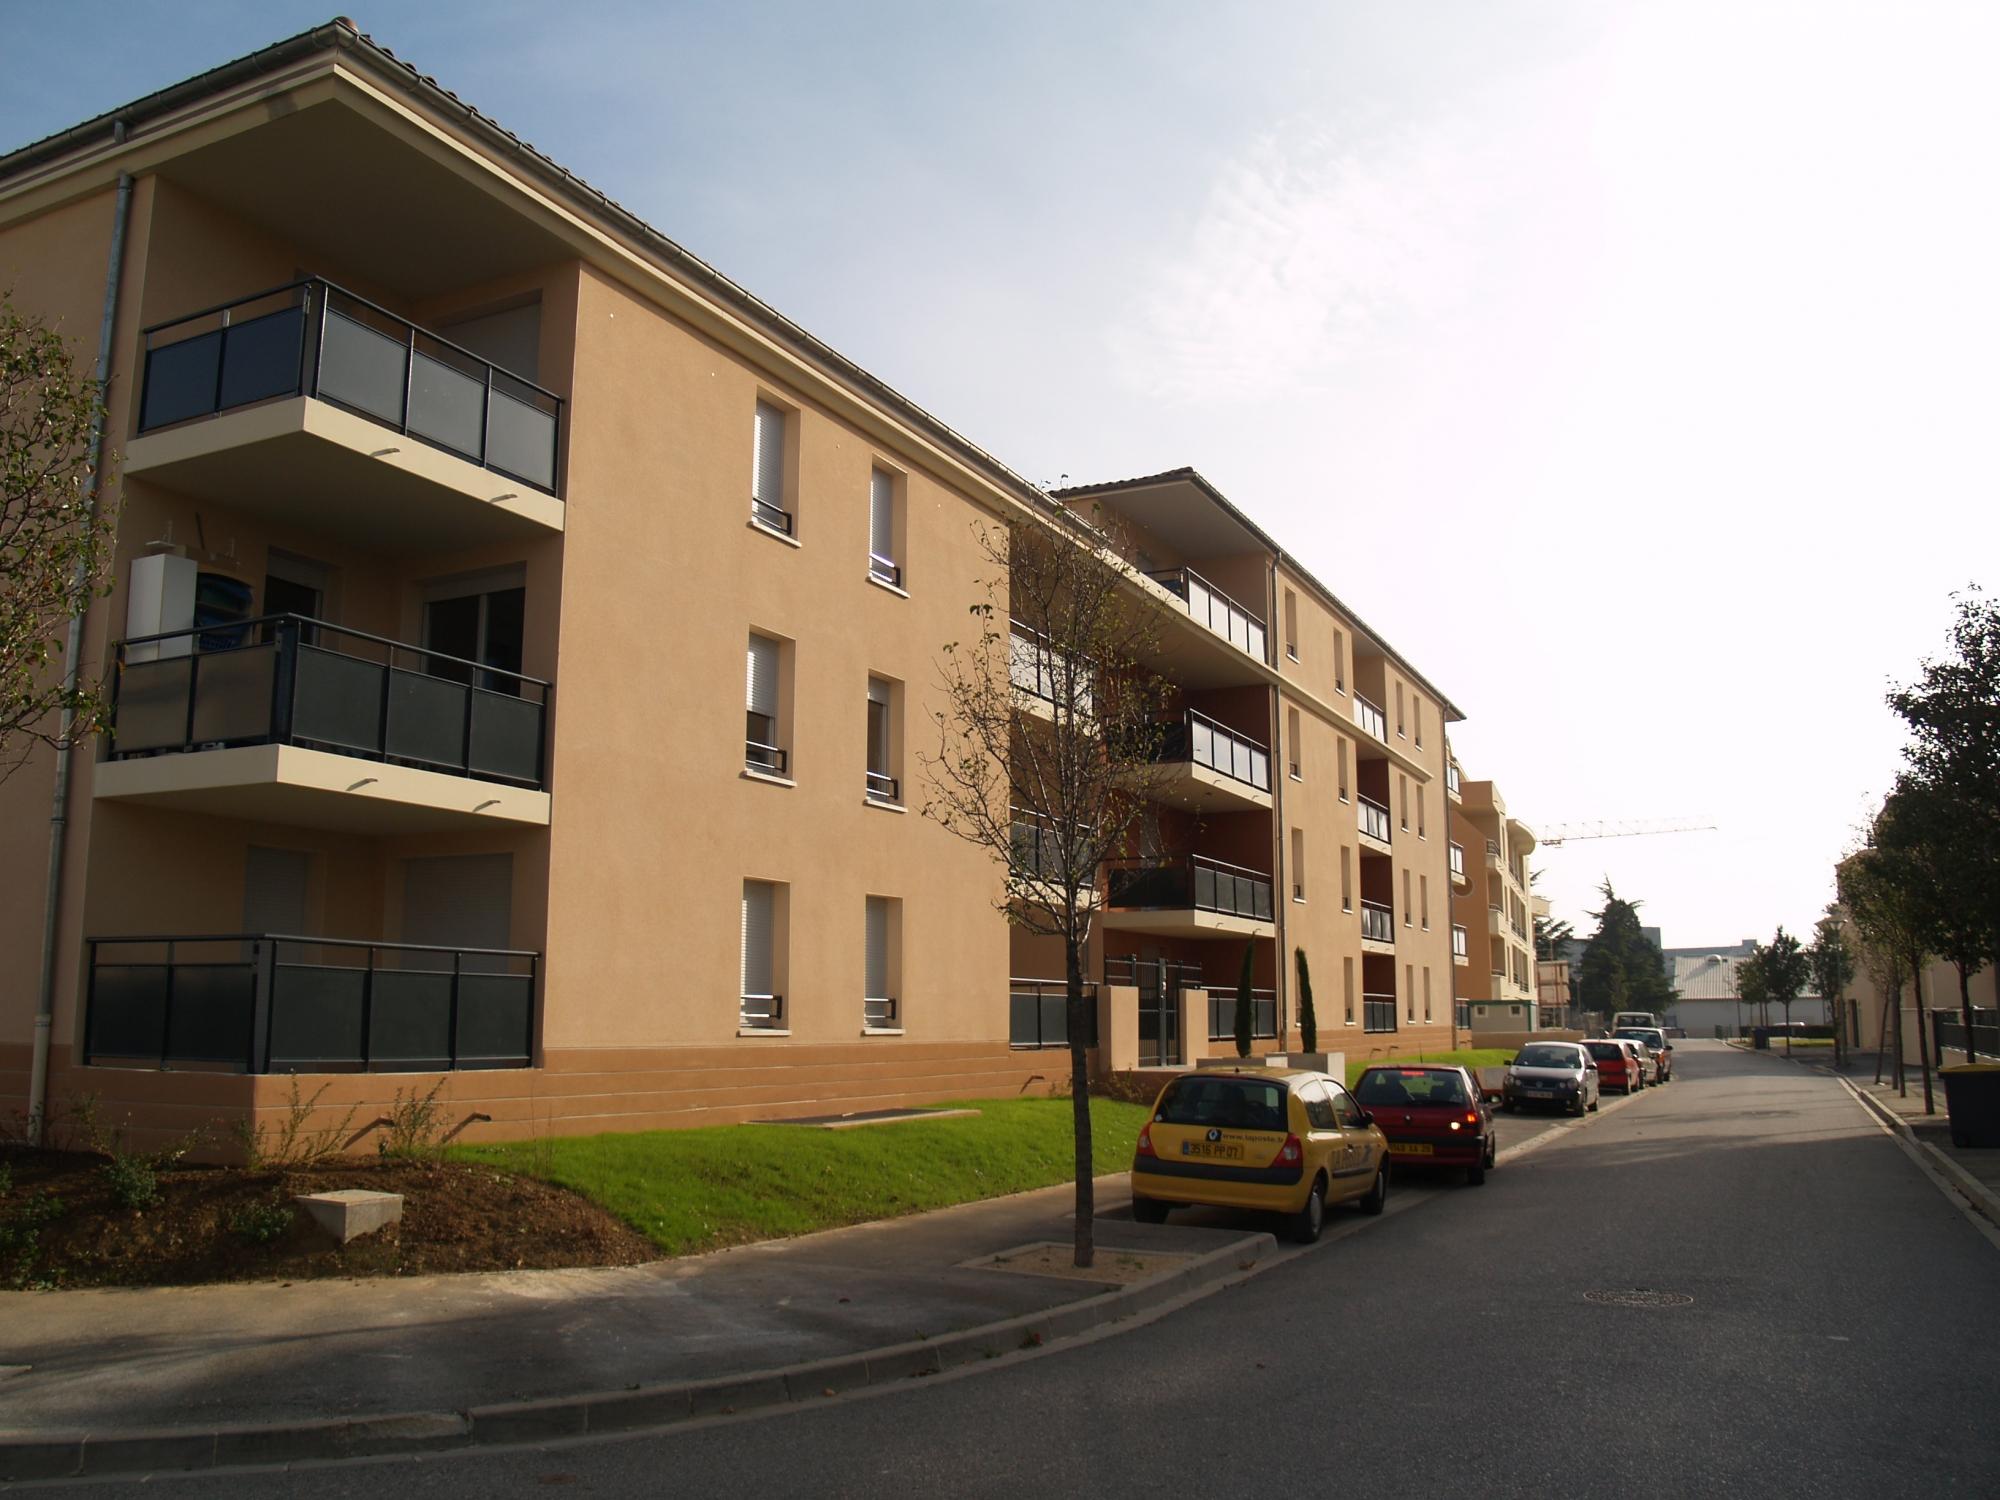 50 logements les terrasses de verlaine valence garin architectes. Black Bedroom Furniture Sets. Home Design Ideas